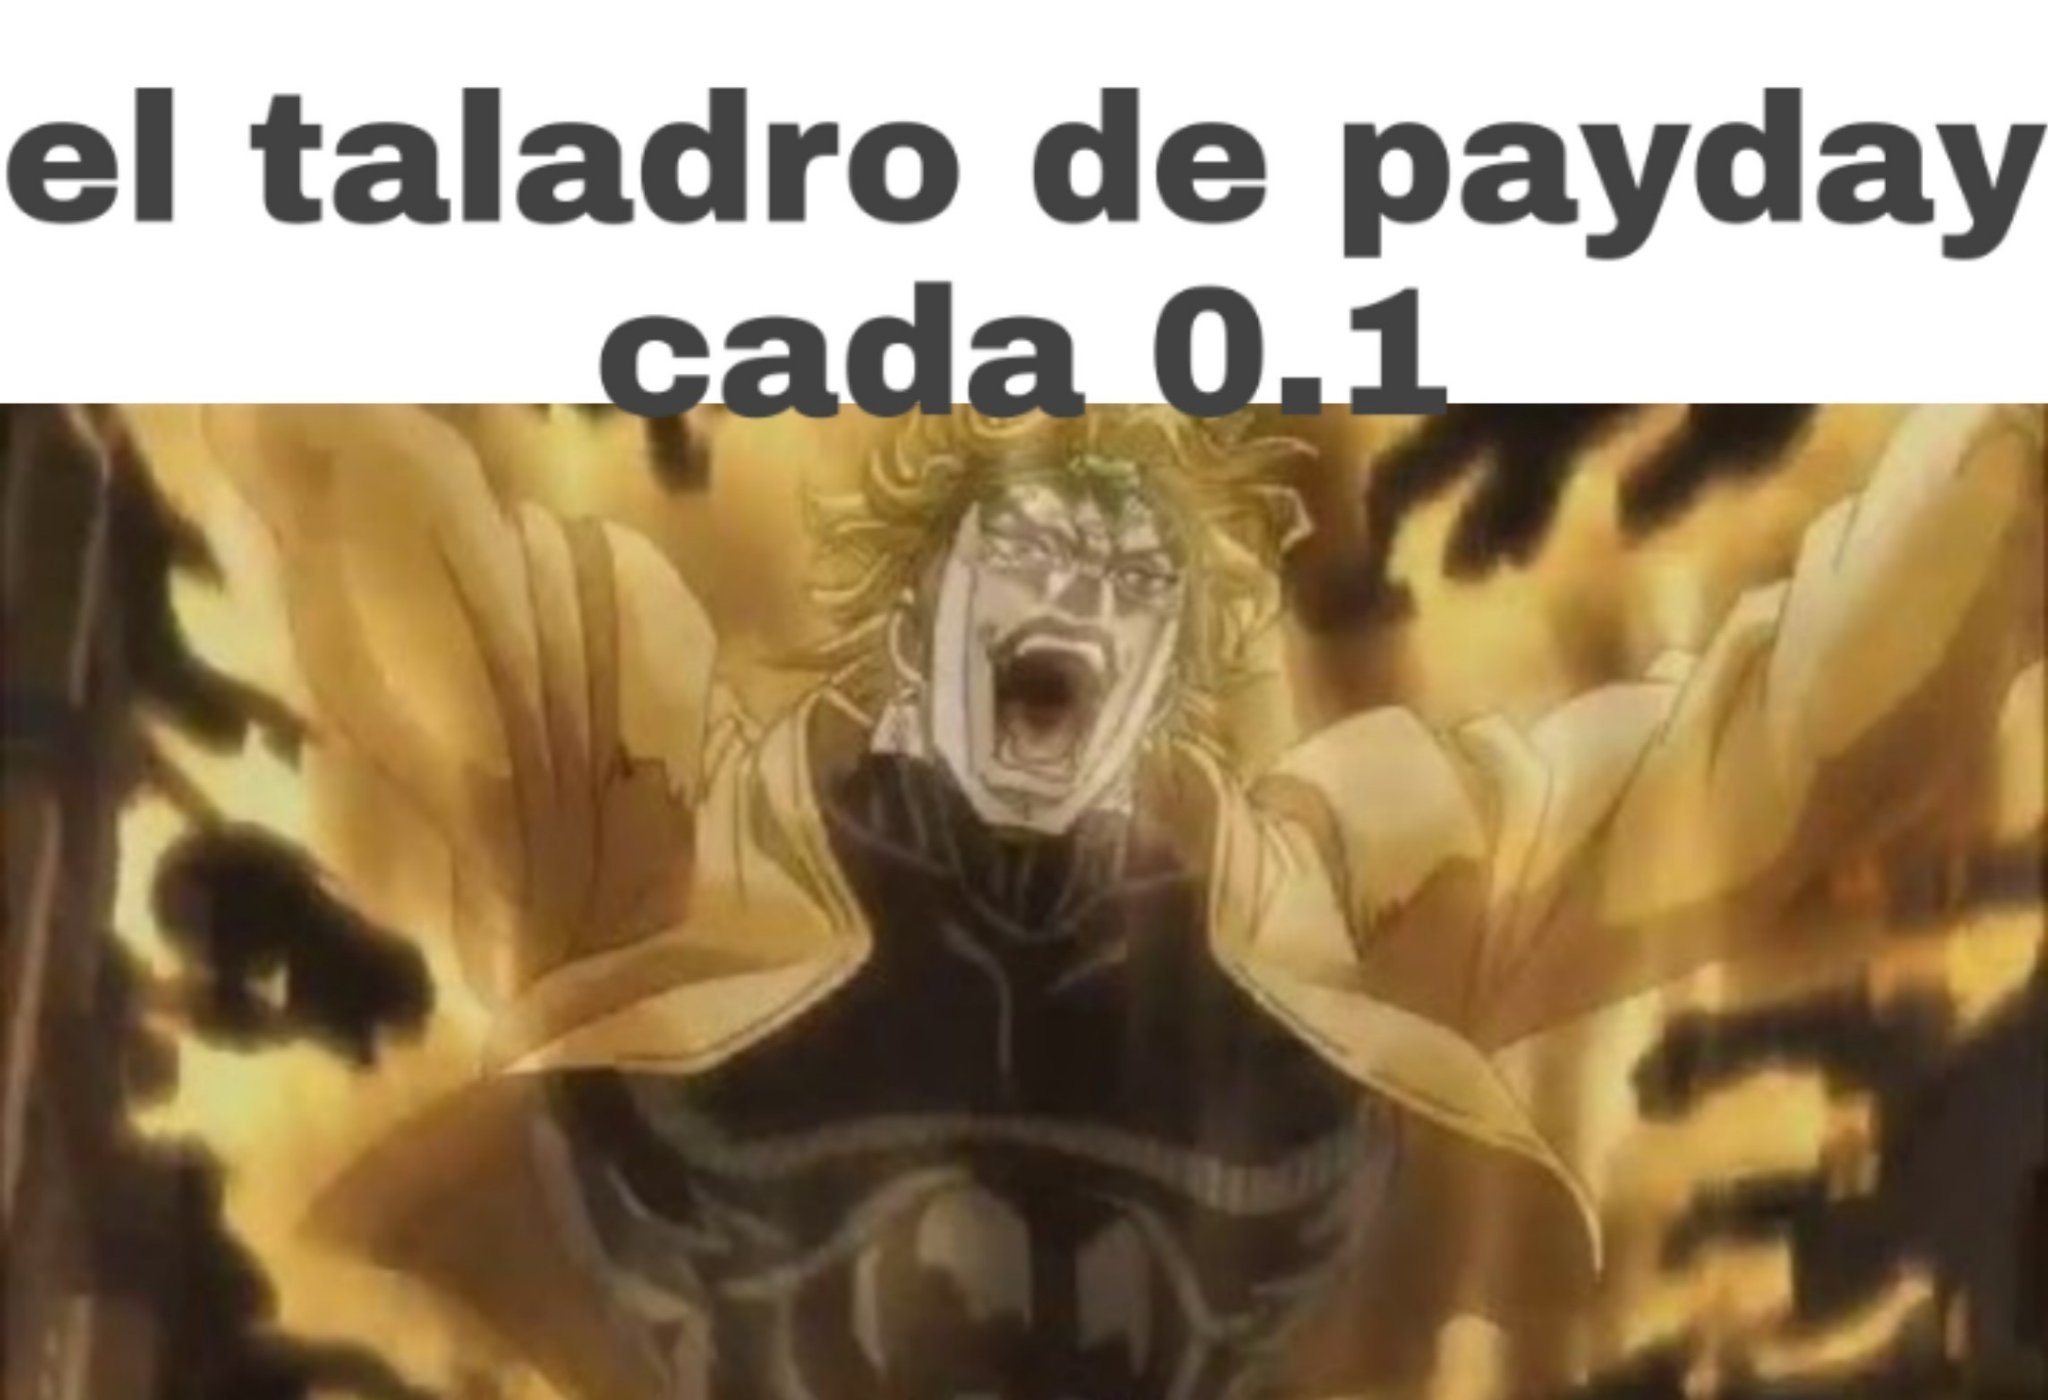 El taladro es chupapijas - meme